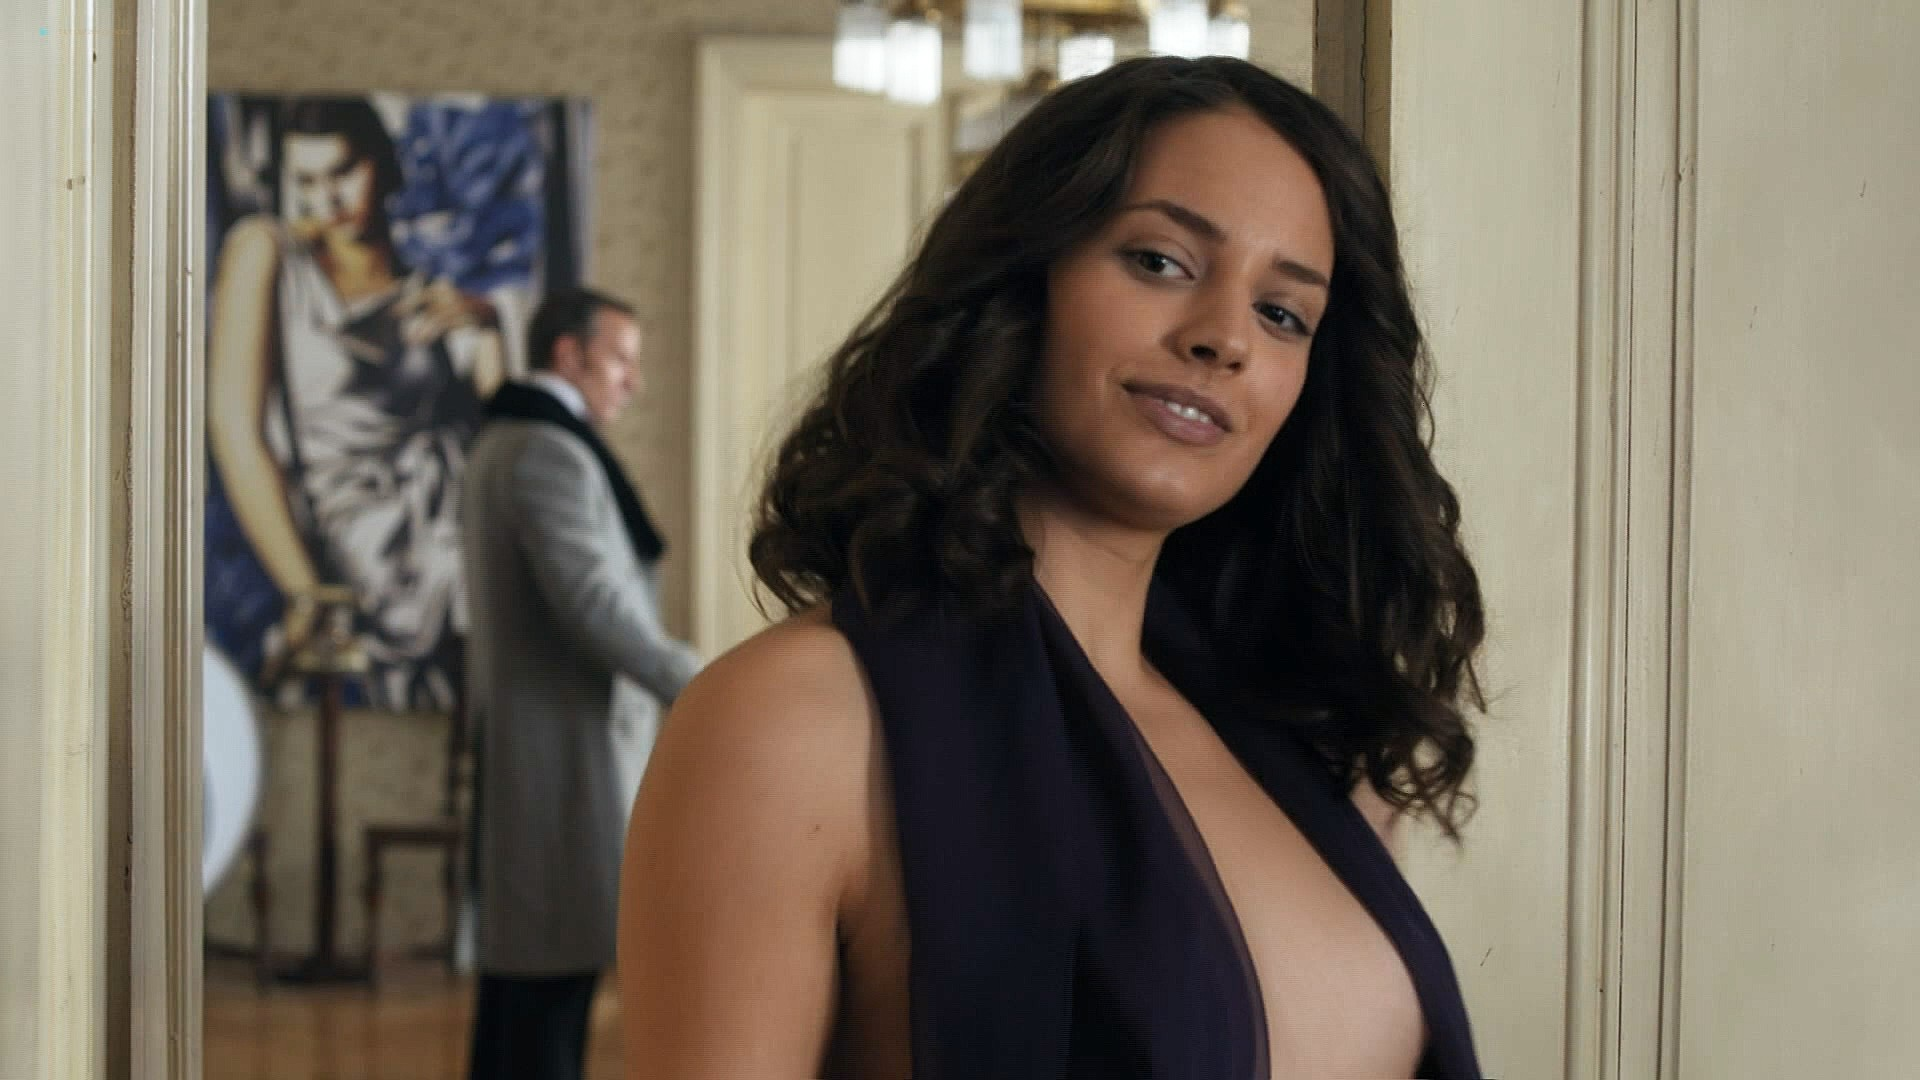 Marija Bergam nude sex Marina Cosic nude topless - Black Sun (2017) s1e7-8 HD 1080p (9)